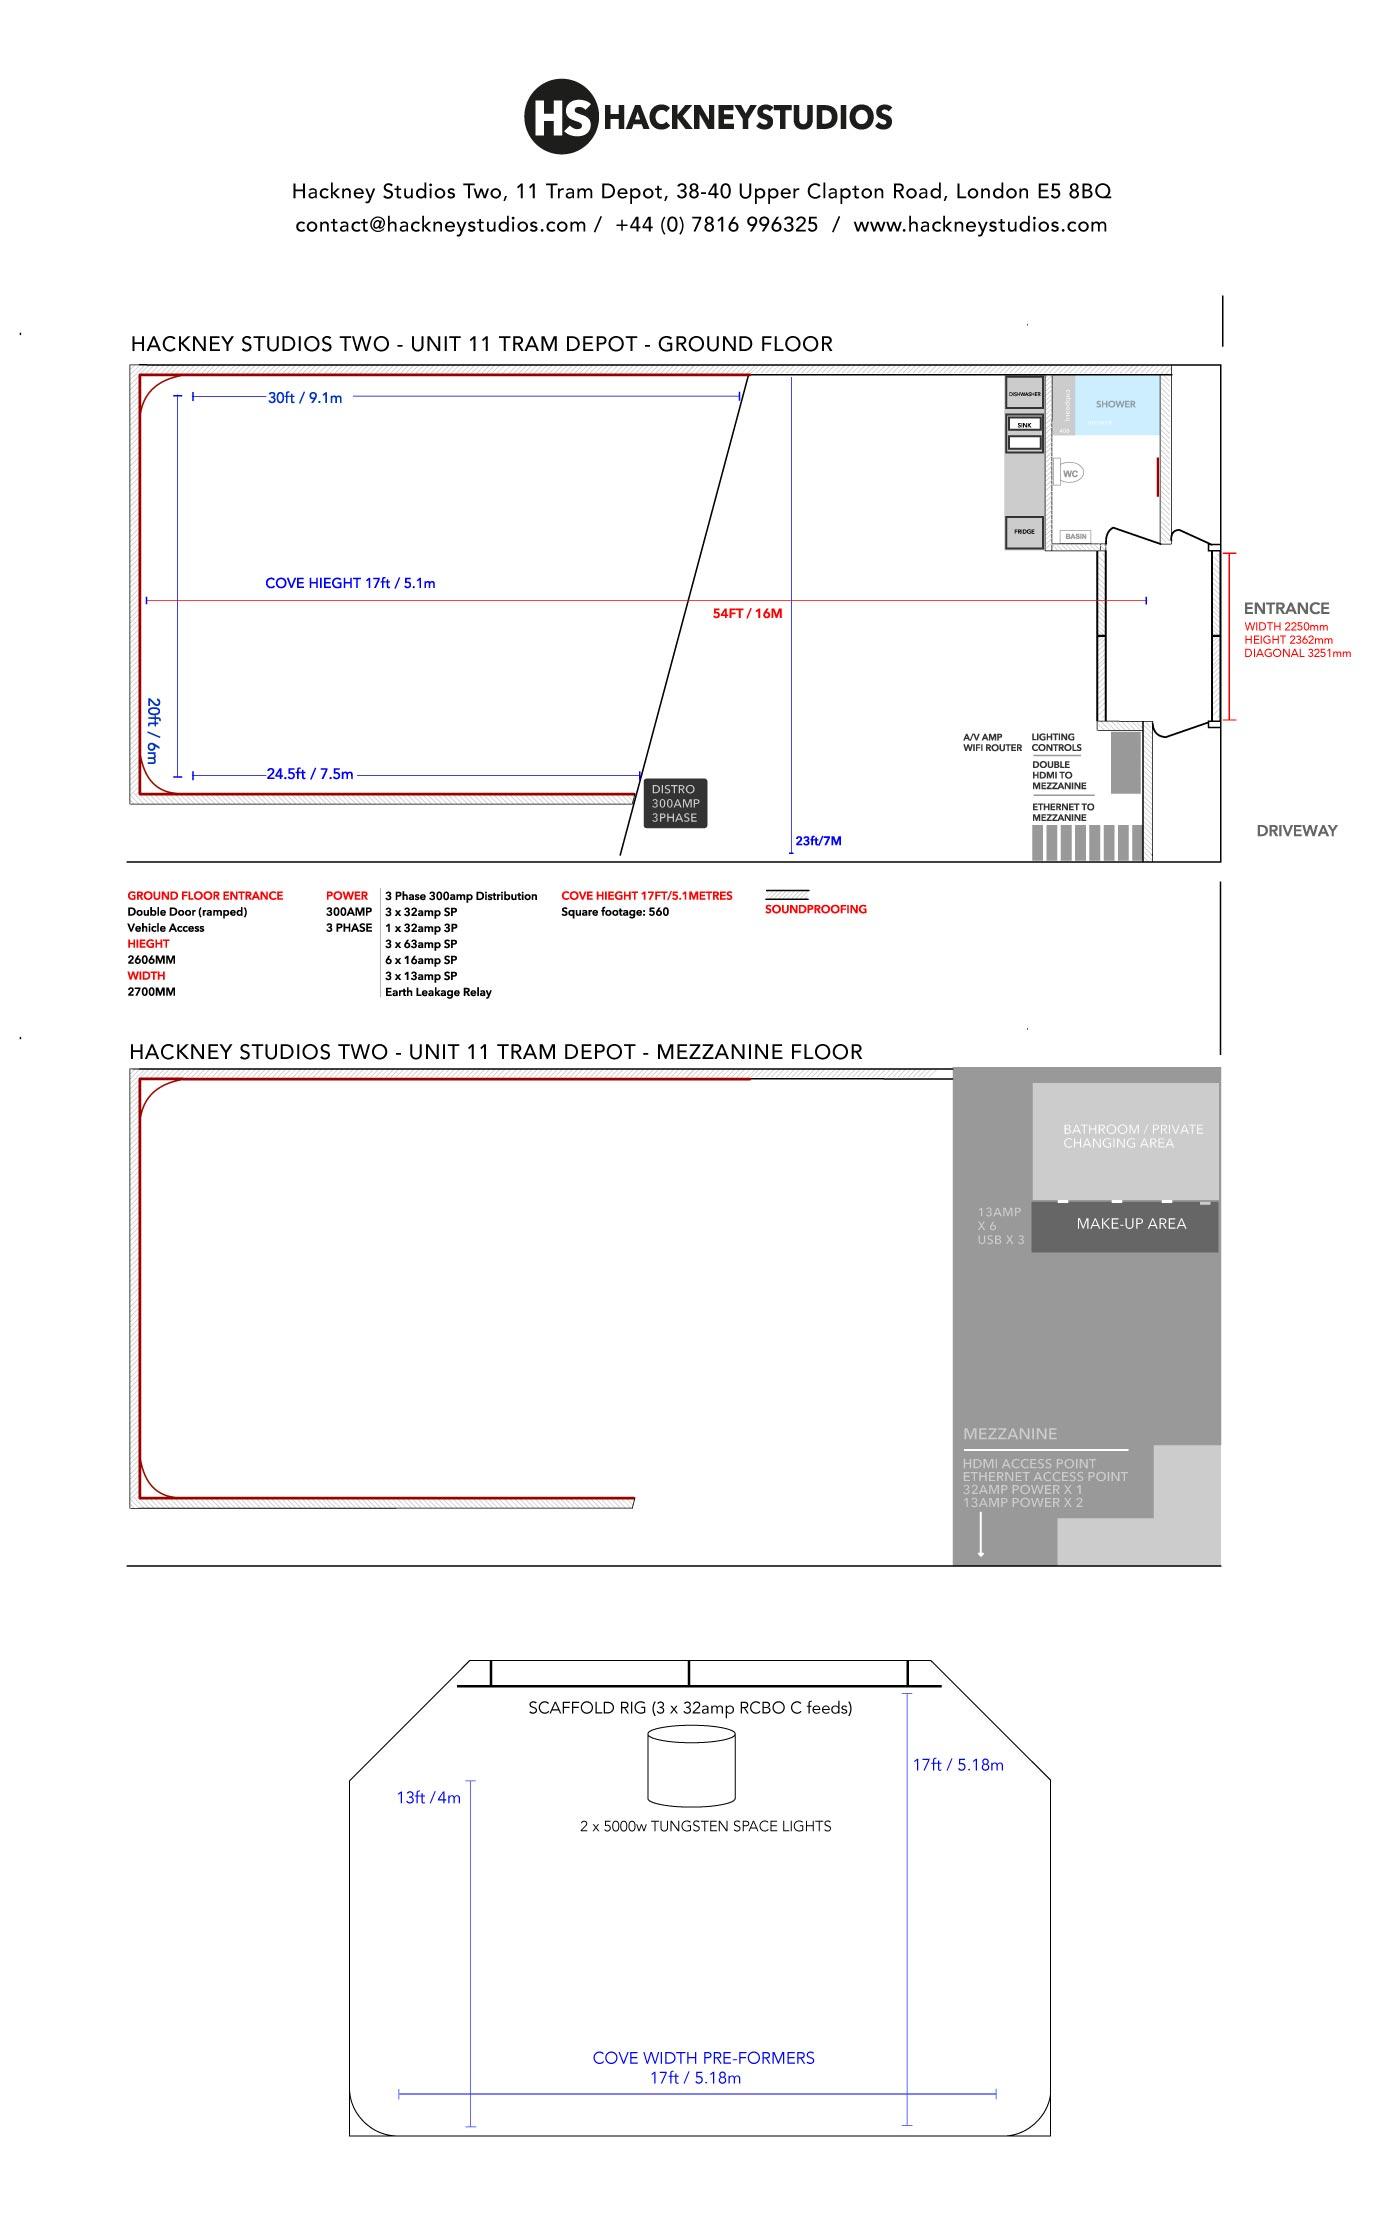 hackney_studios_two_plan